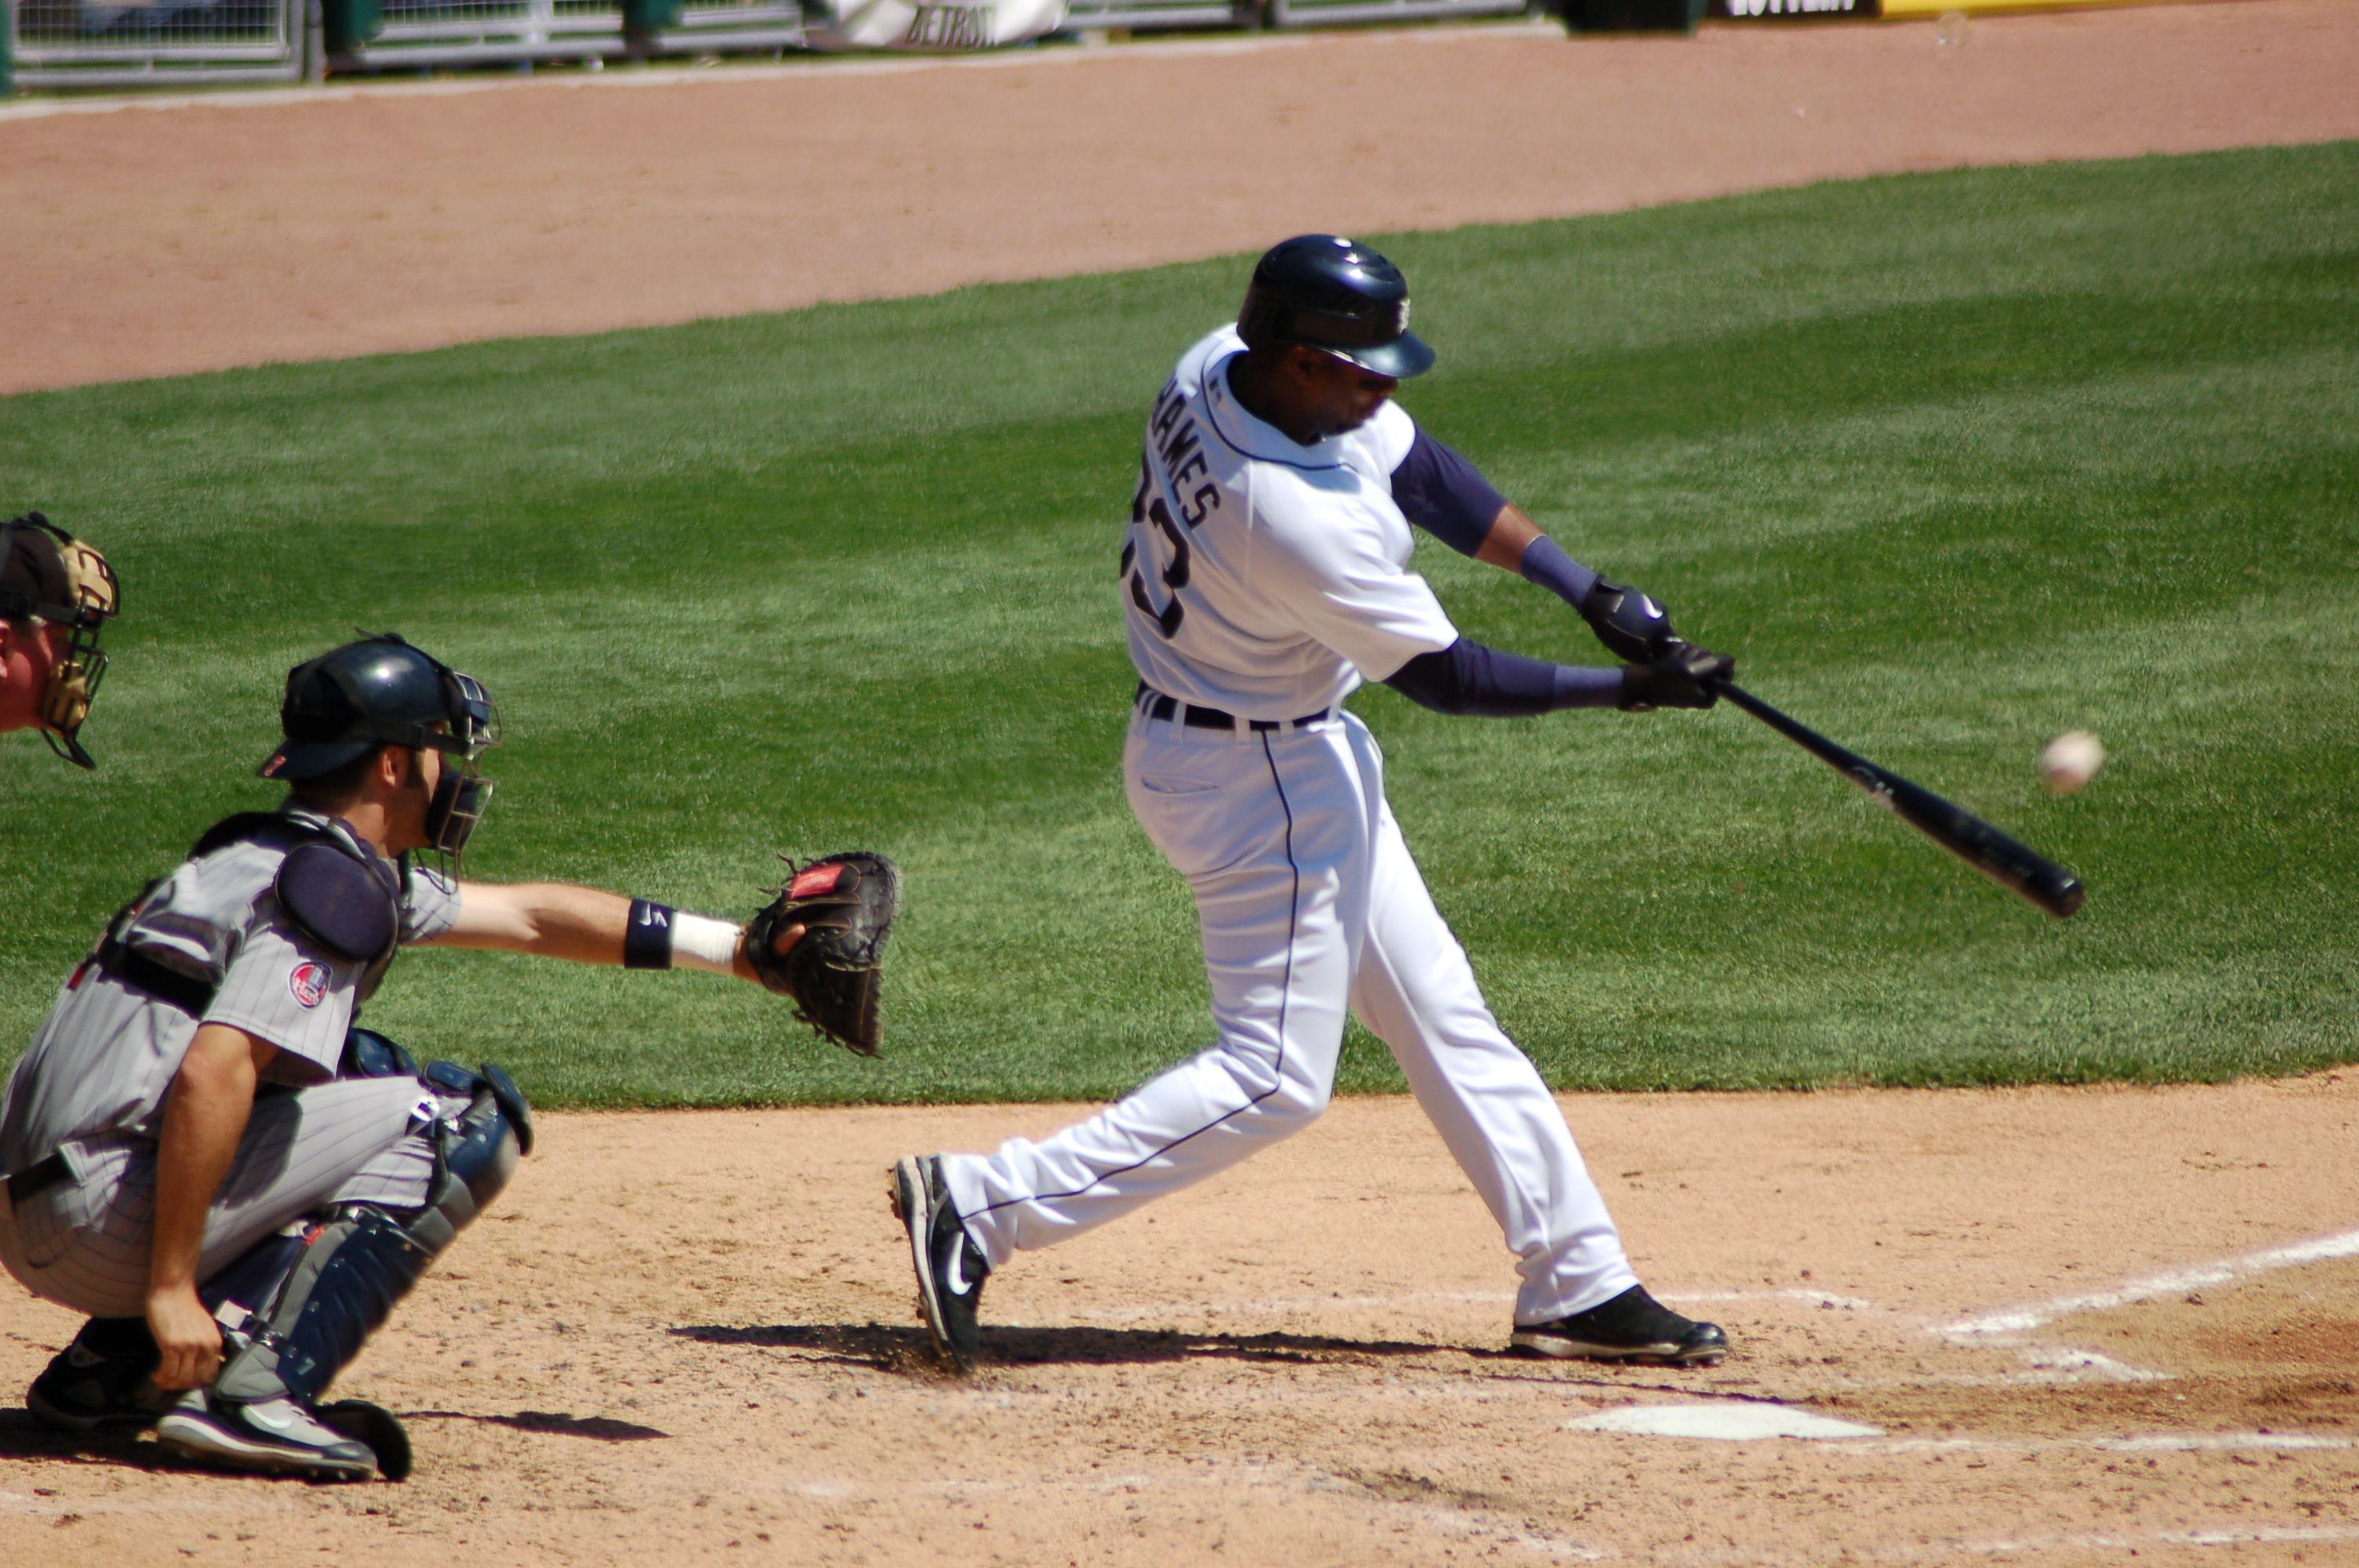 Marcus Thames joins Yankees coaching staff as assistant hitting coach |  Better baseball, Baseball bat, Baseball live